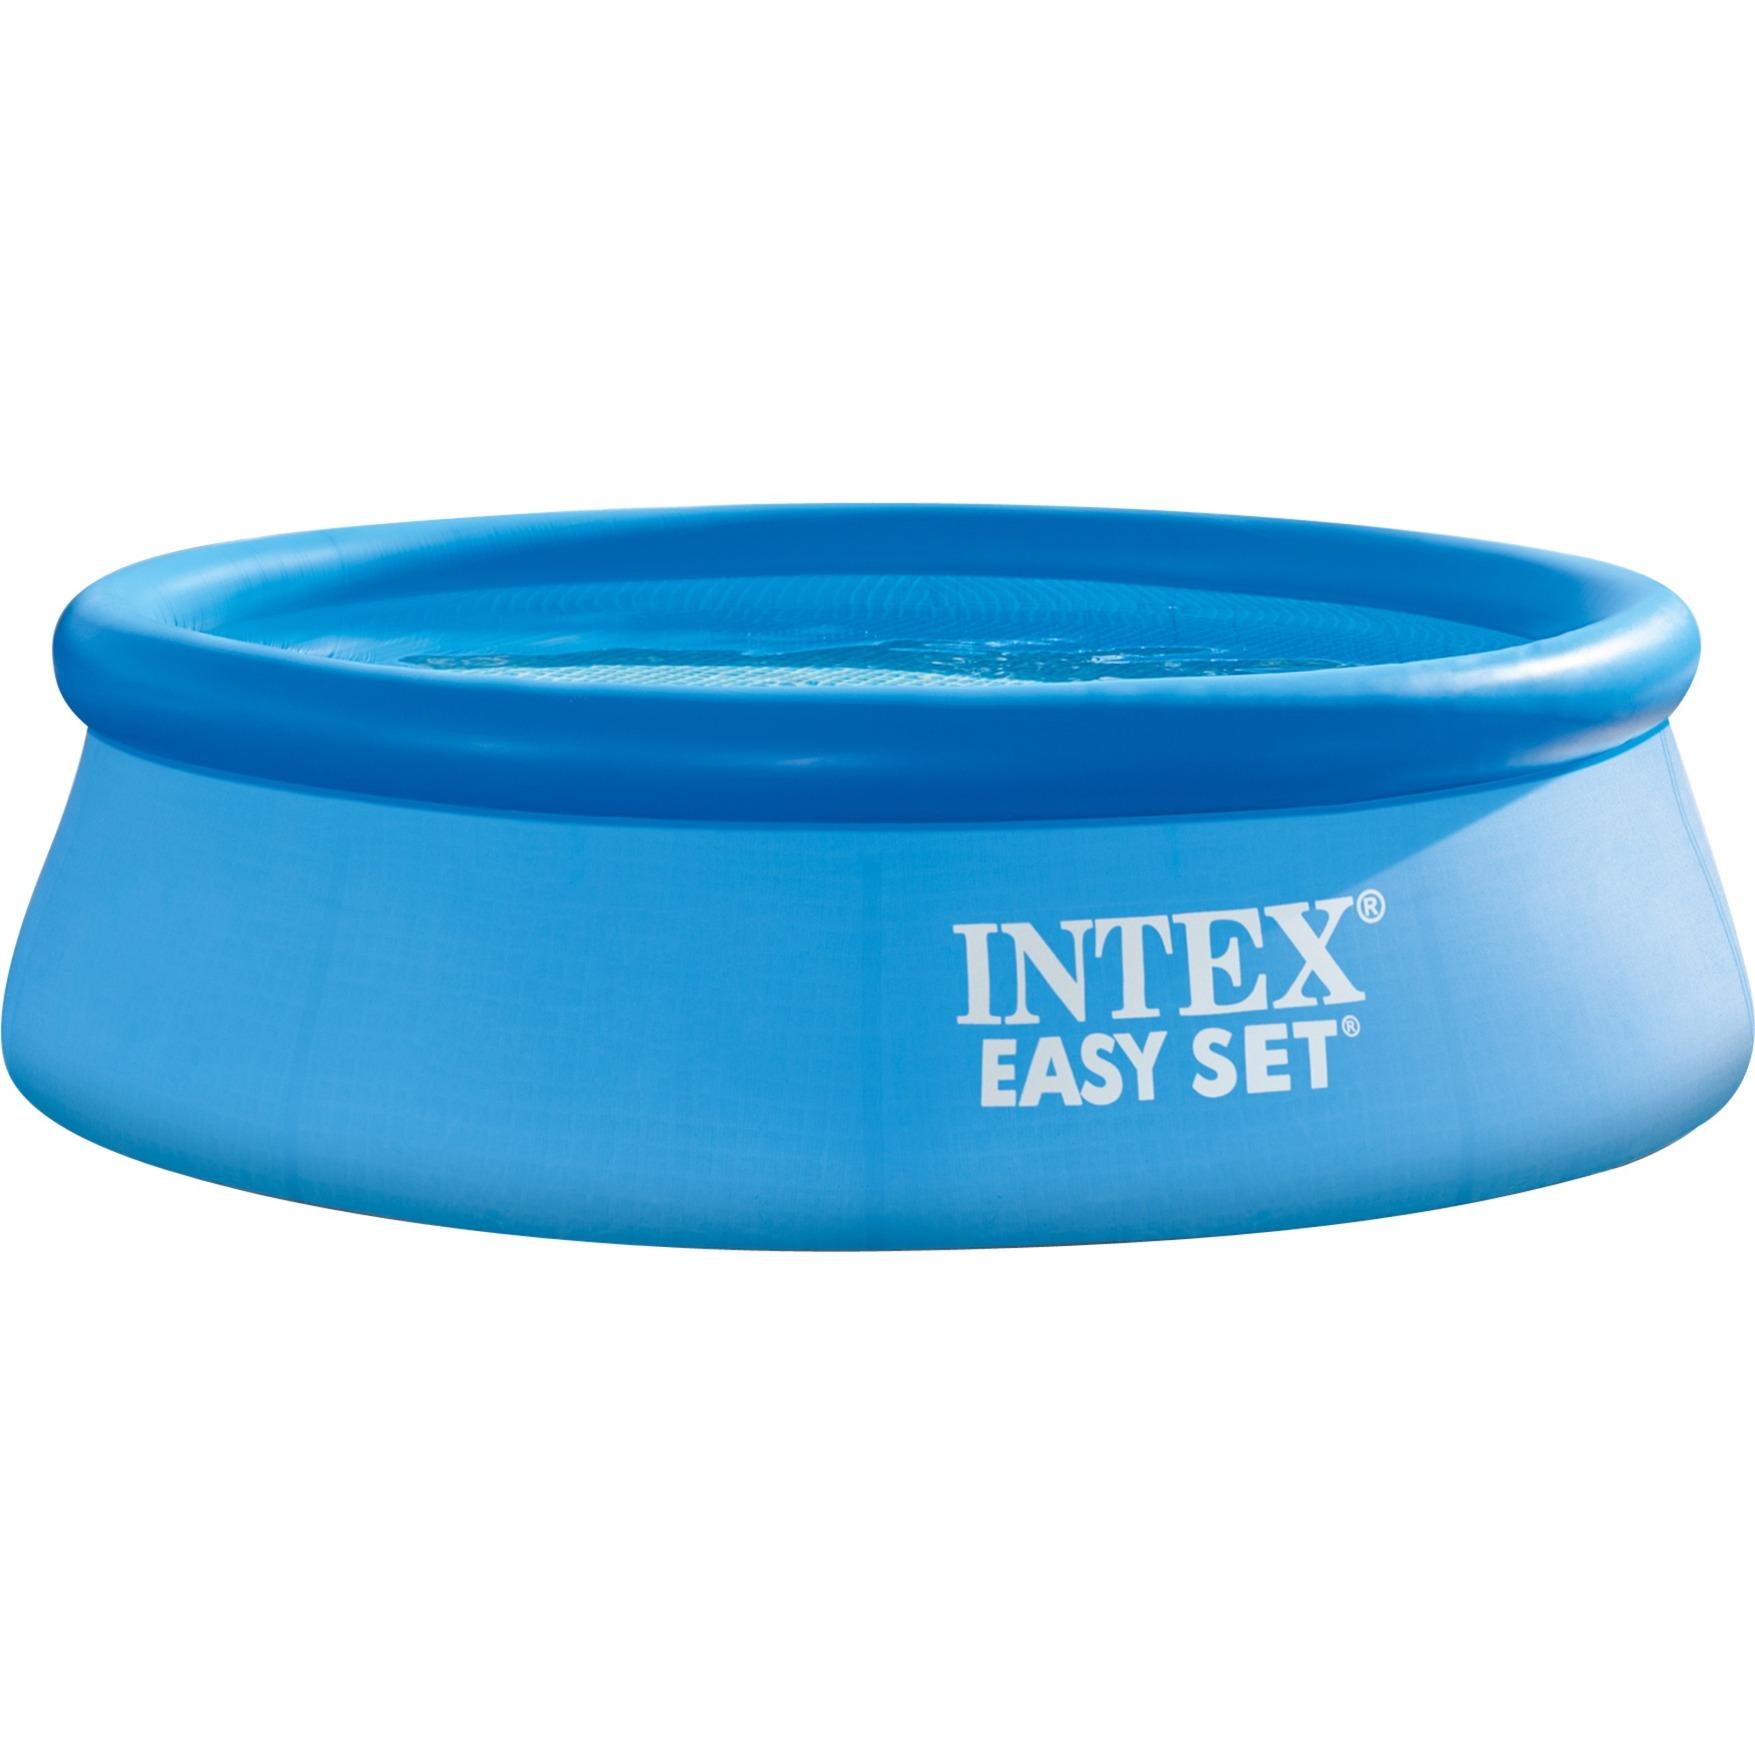 Piscine italia piscina intex easy prezzi migliori offerte for Piscine intex prezzi e offerte